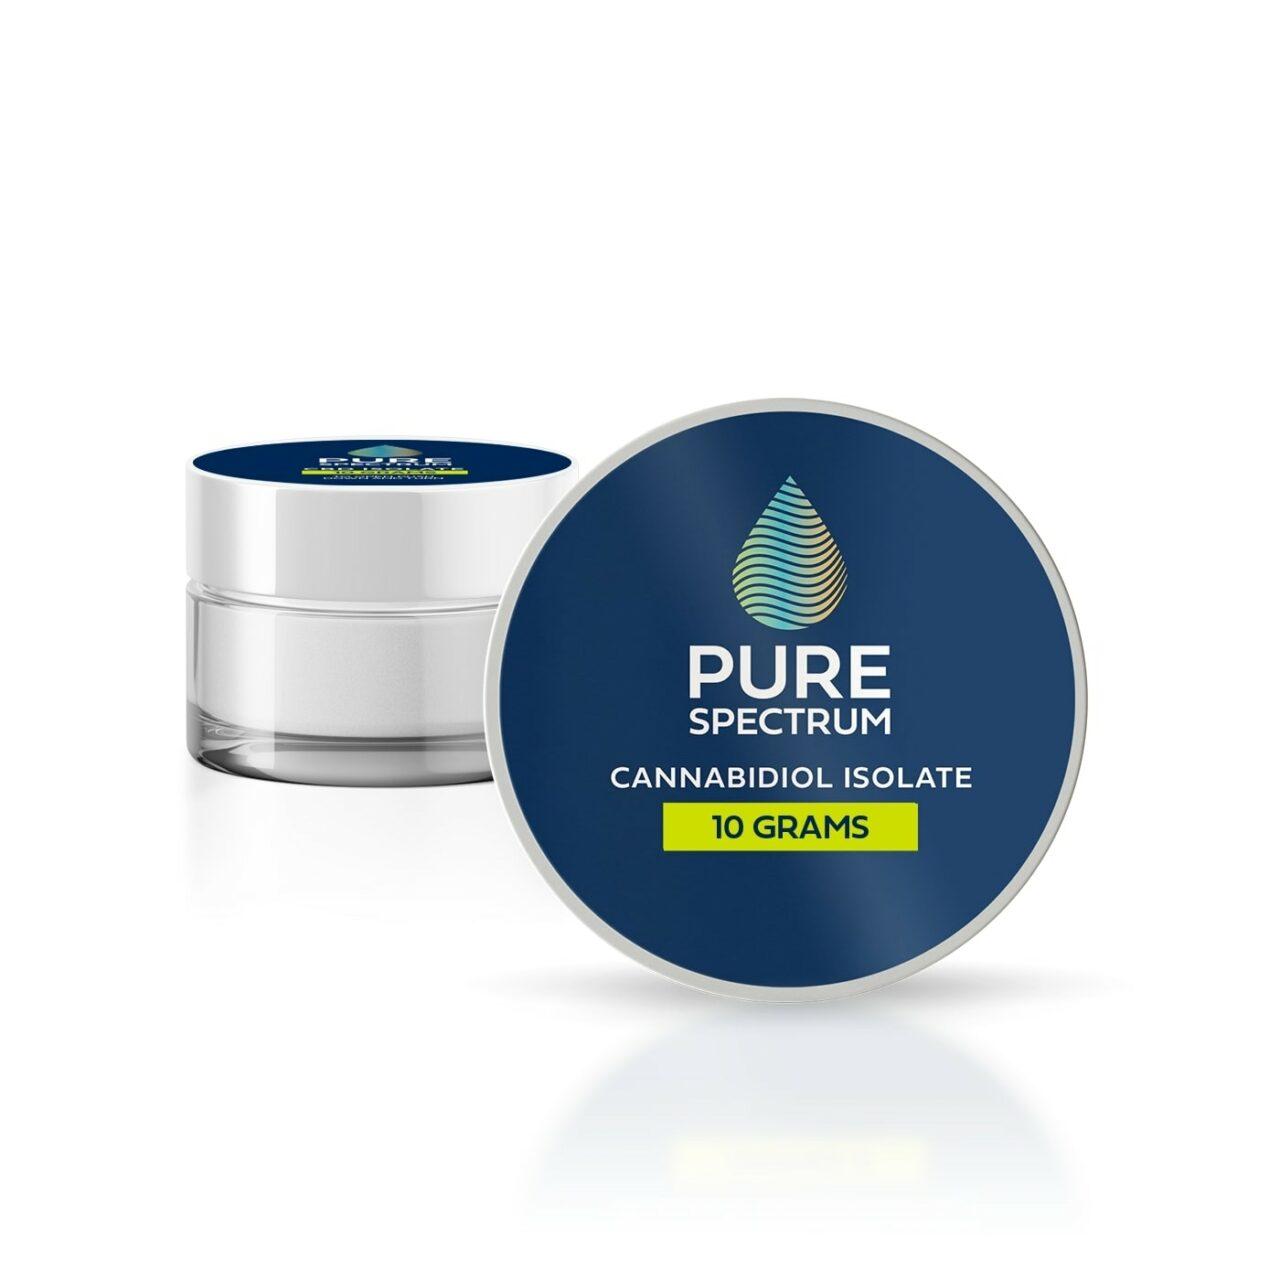 Pure Spectrum, 99% CBD Isolate Powder, 10g, 10000mg of CBD2